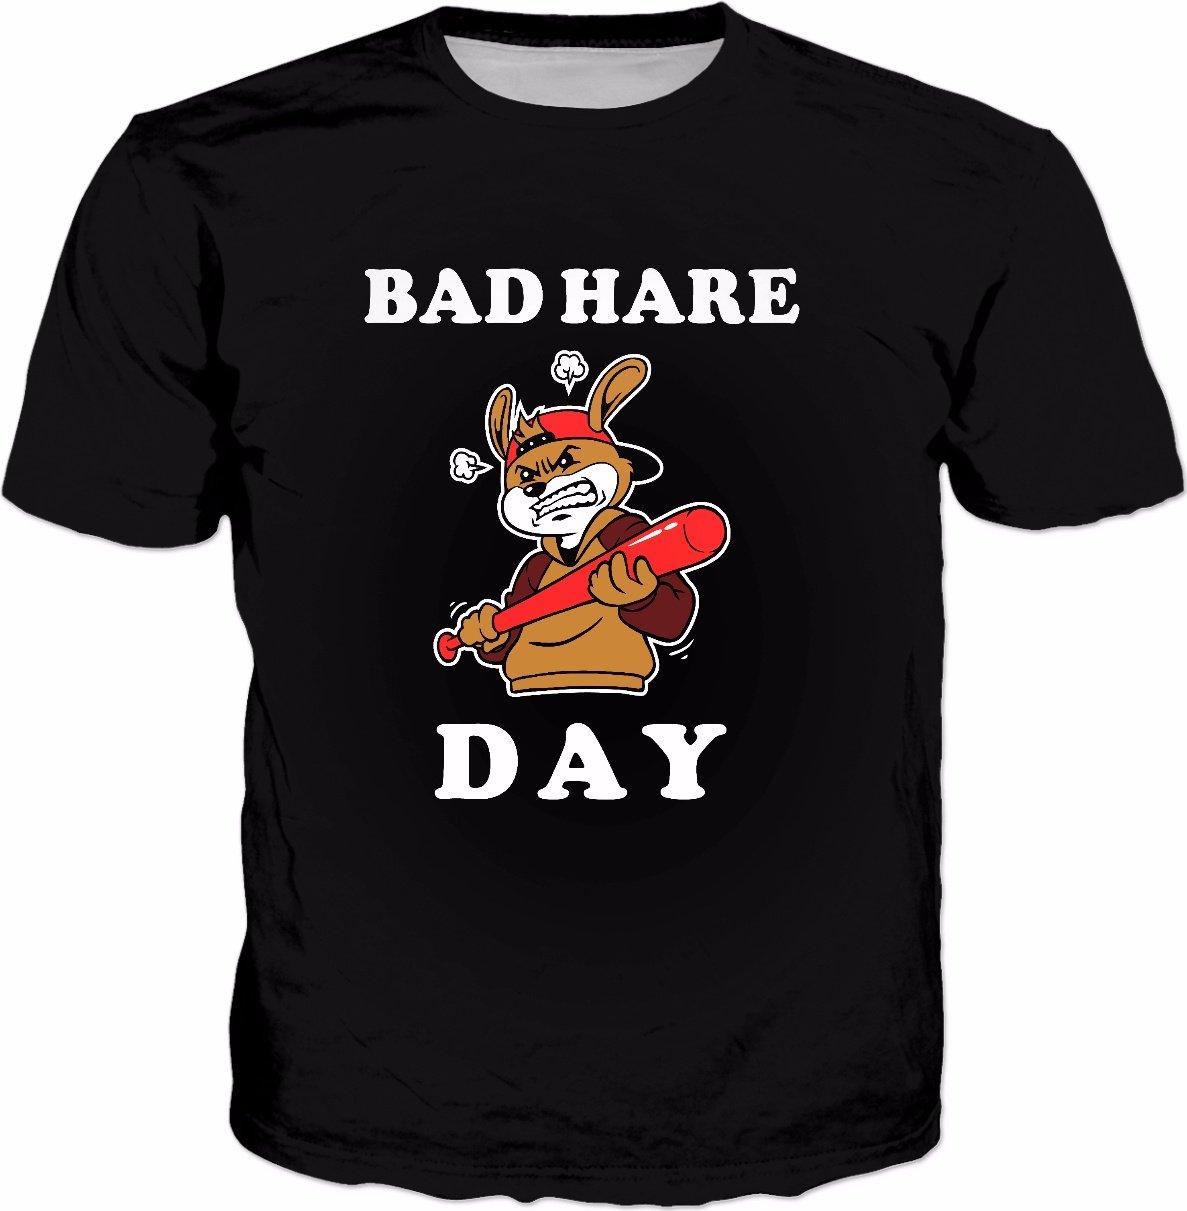 Bad hare day tshirt rabbit bad hair pun shirts t